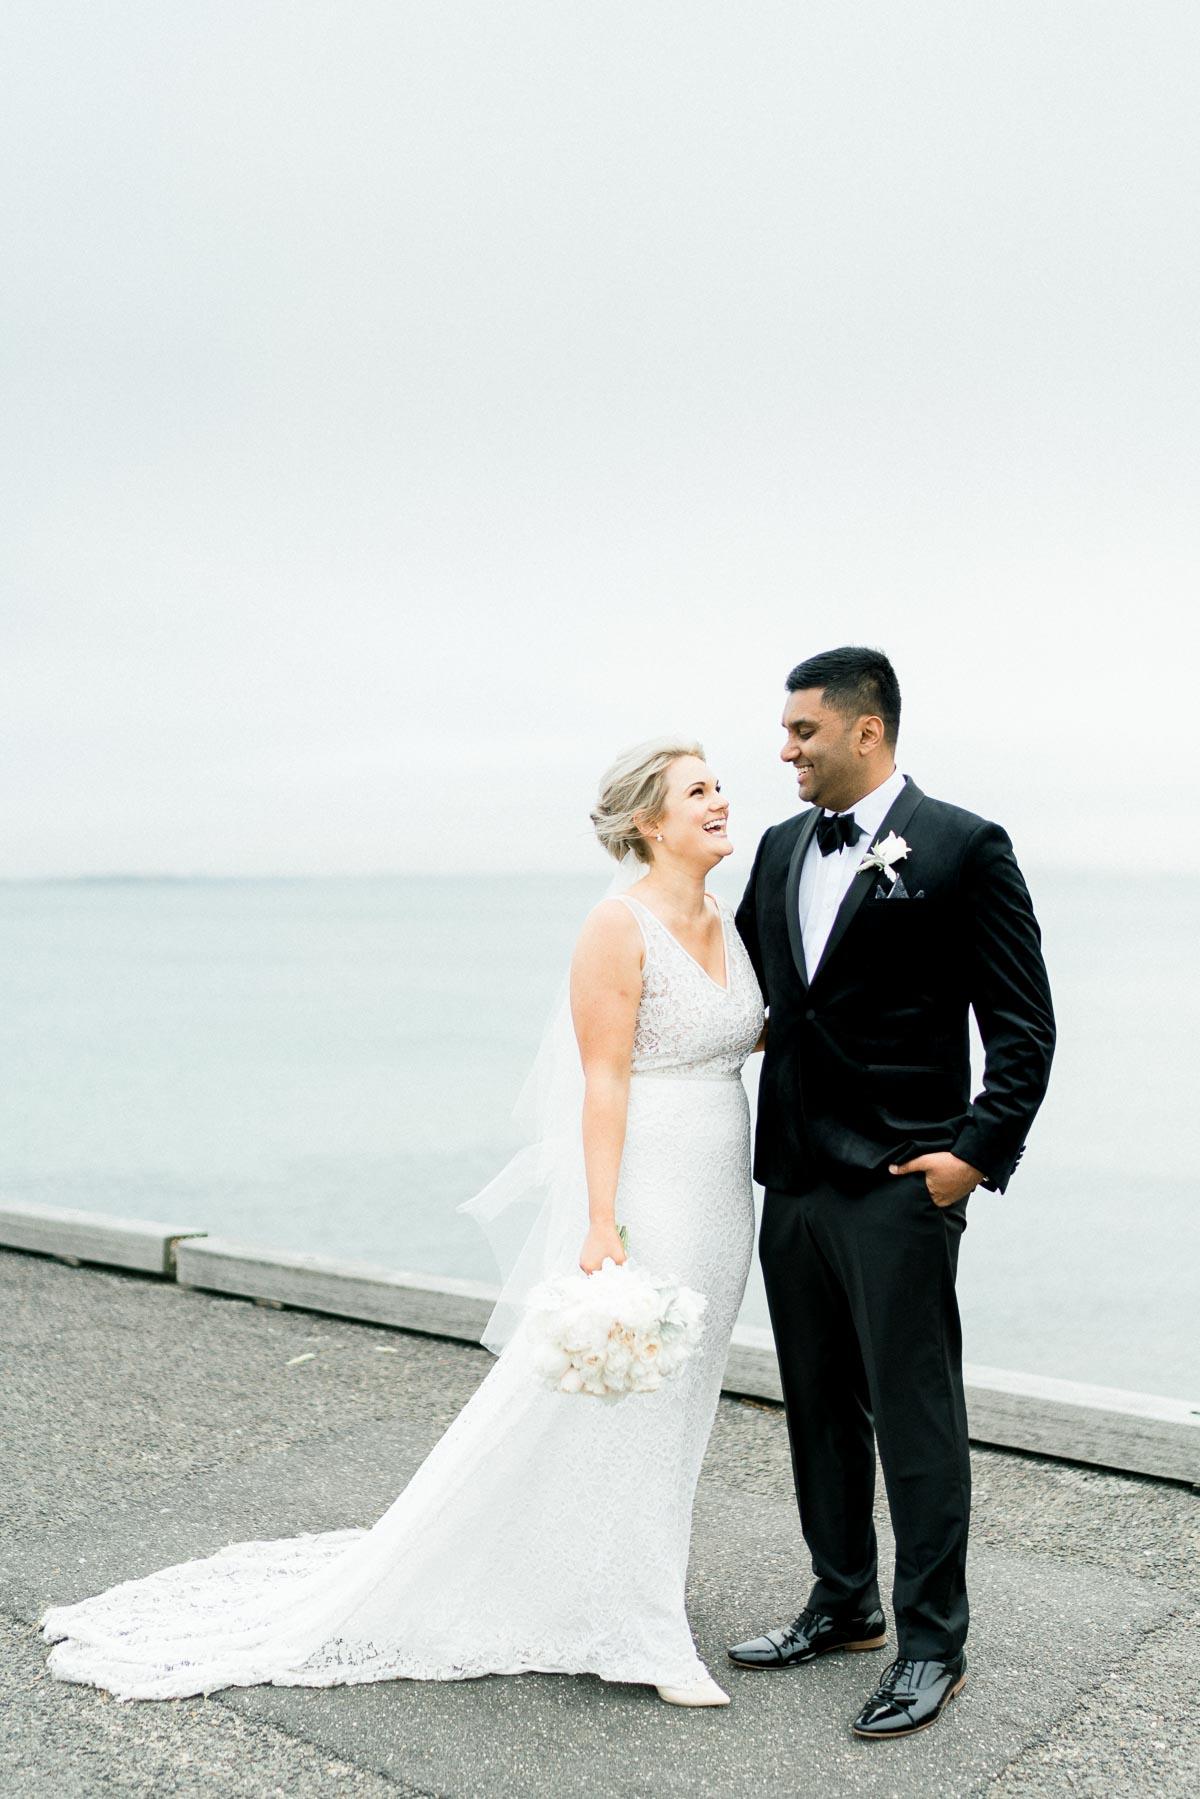 trenavin-chapel-phillip-island-wedding-heart+soul-weddings-sally-sean-01771.jpg